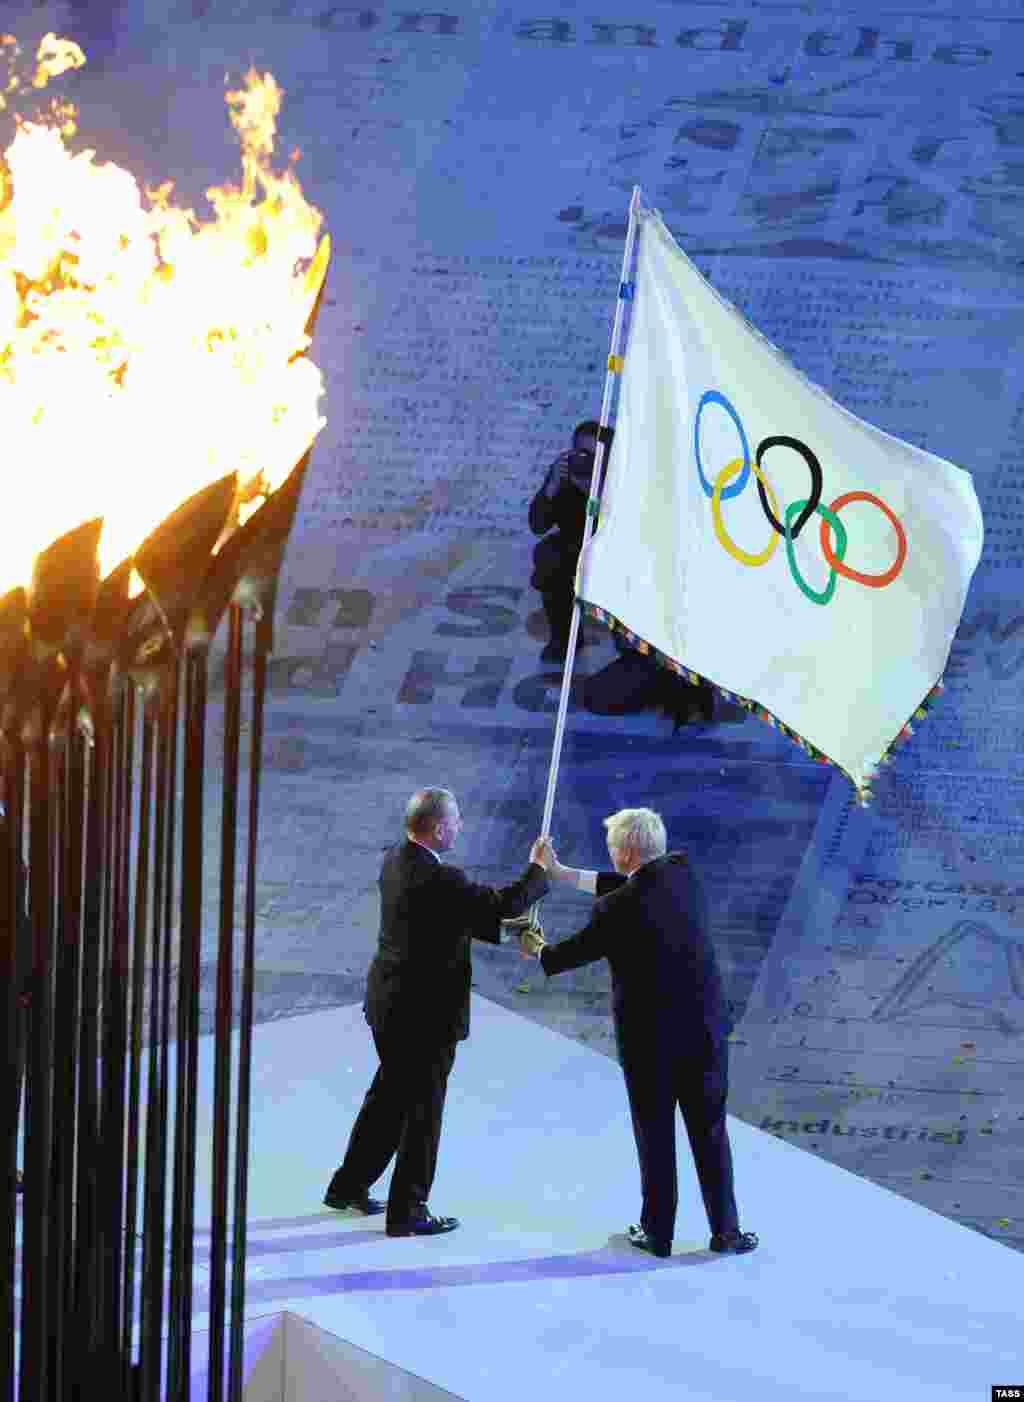 Олимпия комитеты рәисе Жак Рогге һәм Рио-де-Жанейро мэры Эдуардо Паес (с) ябылу тантанасында Олимпия әләмен күтәрә